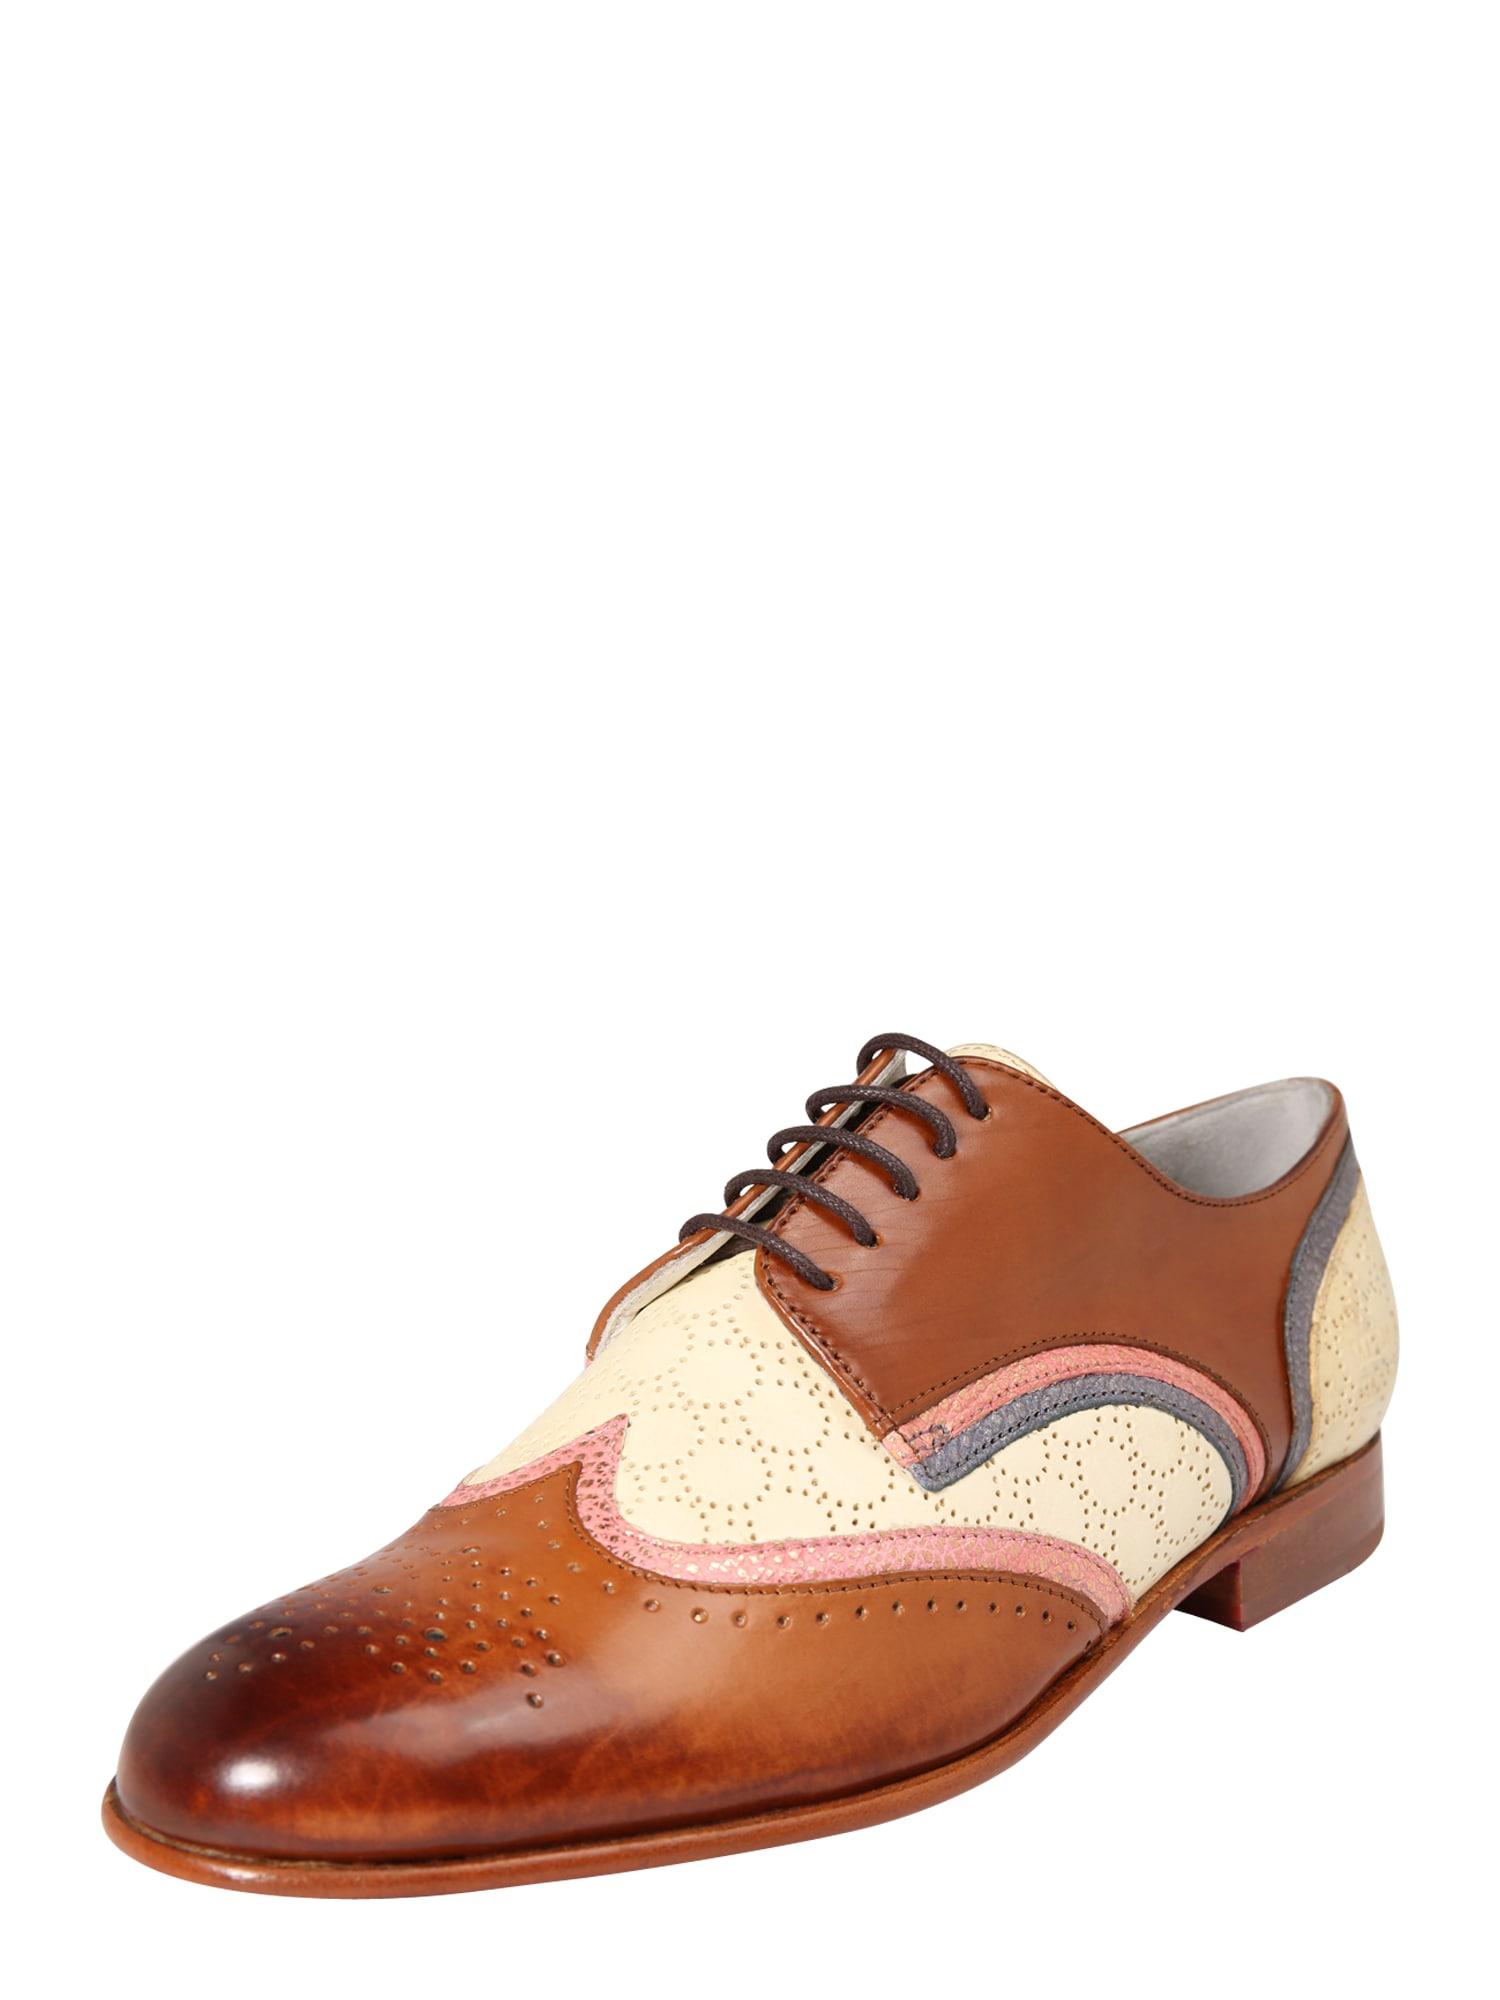 Šněrovací boty Sally 15 hnědá růžová bílá MELVIN & HAMILTON